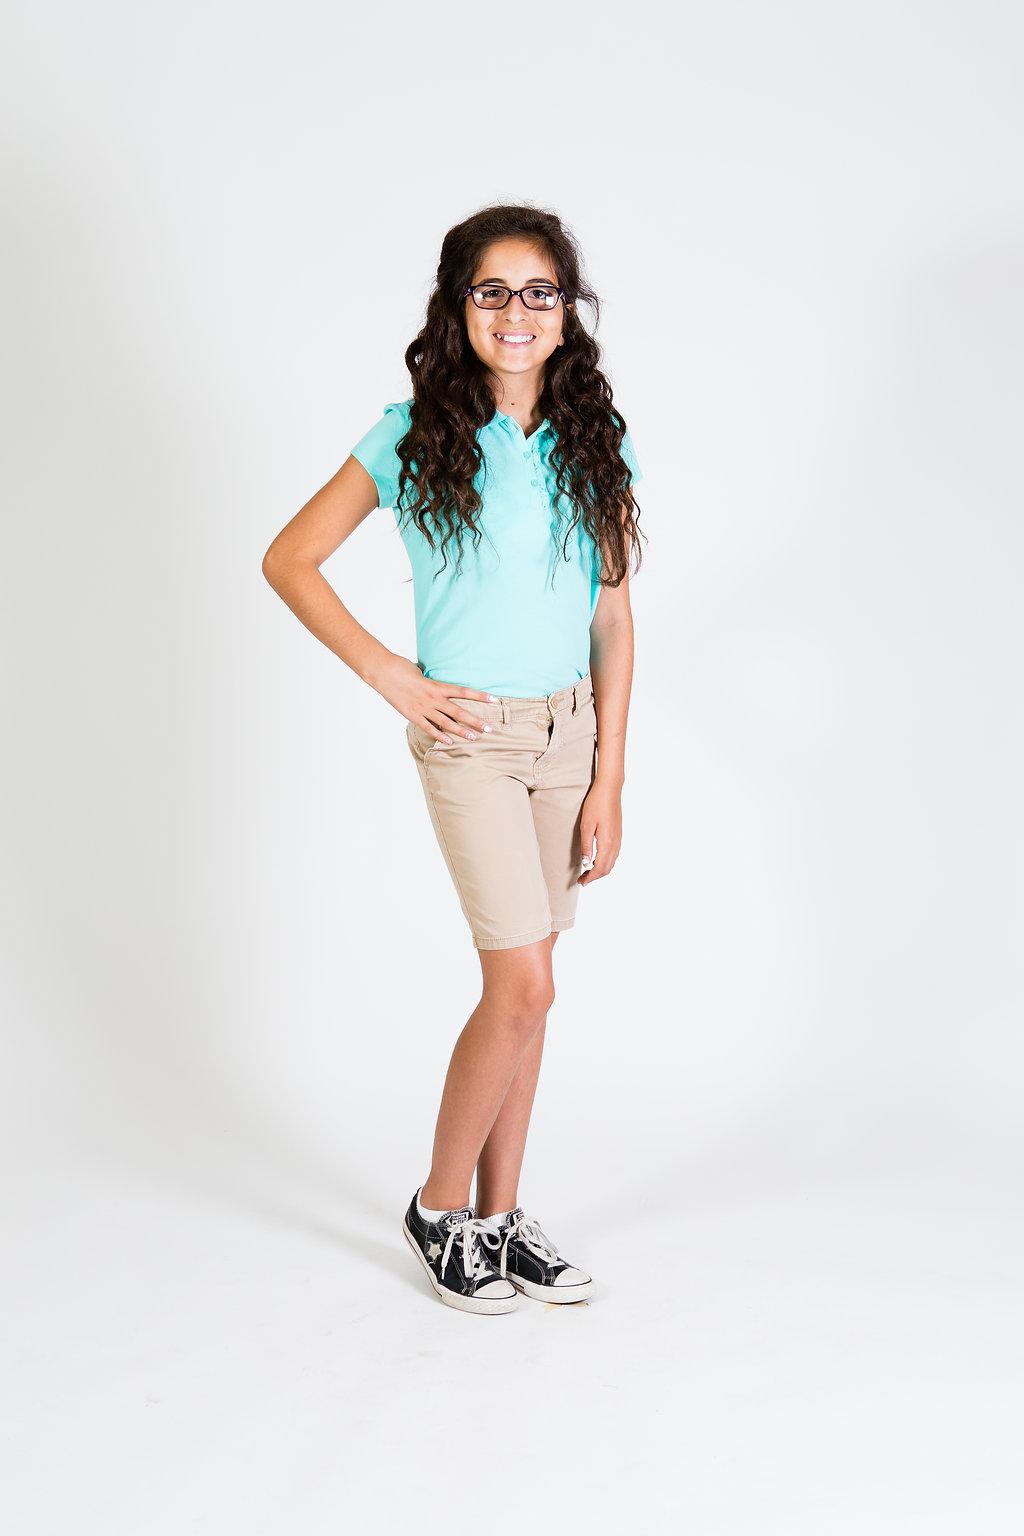 16JuneWCA_Uniforms169-Edit.jpg